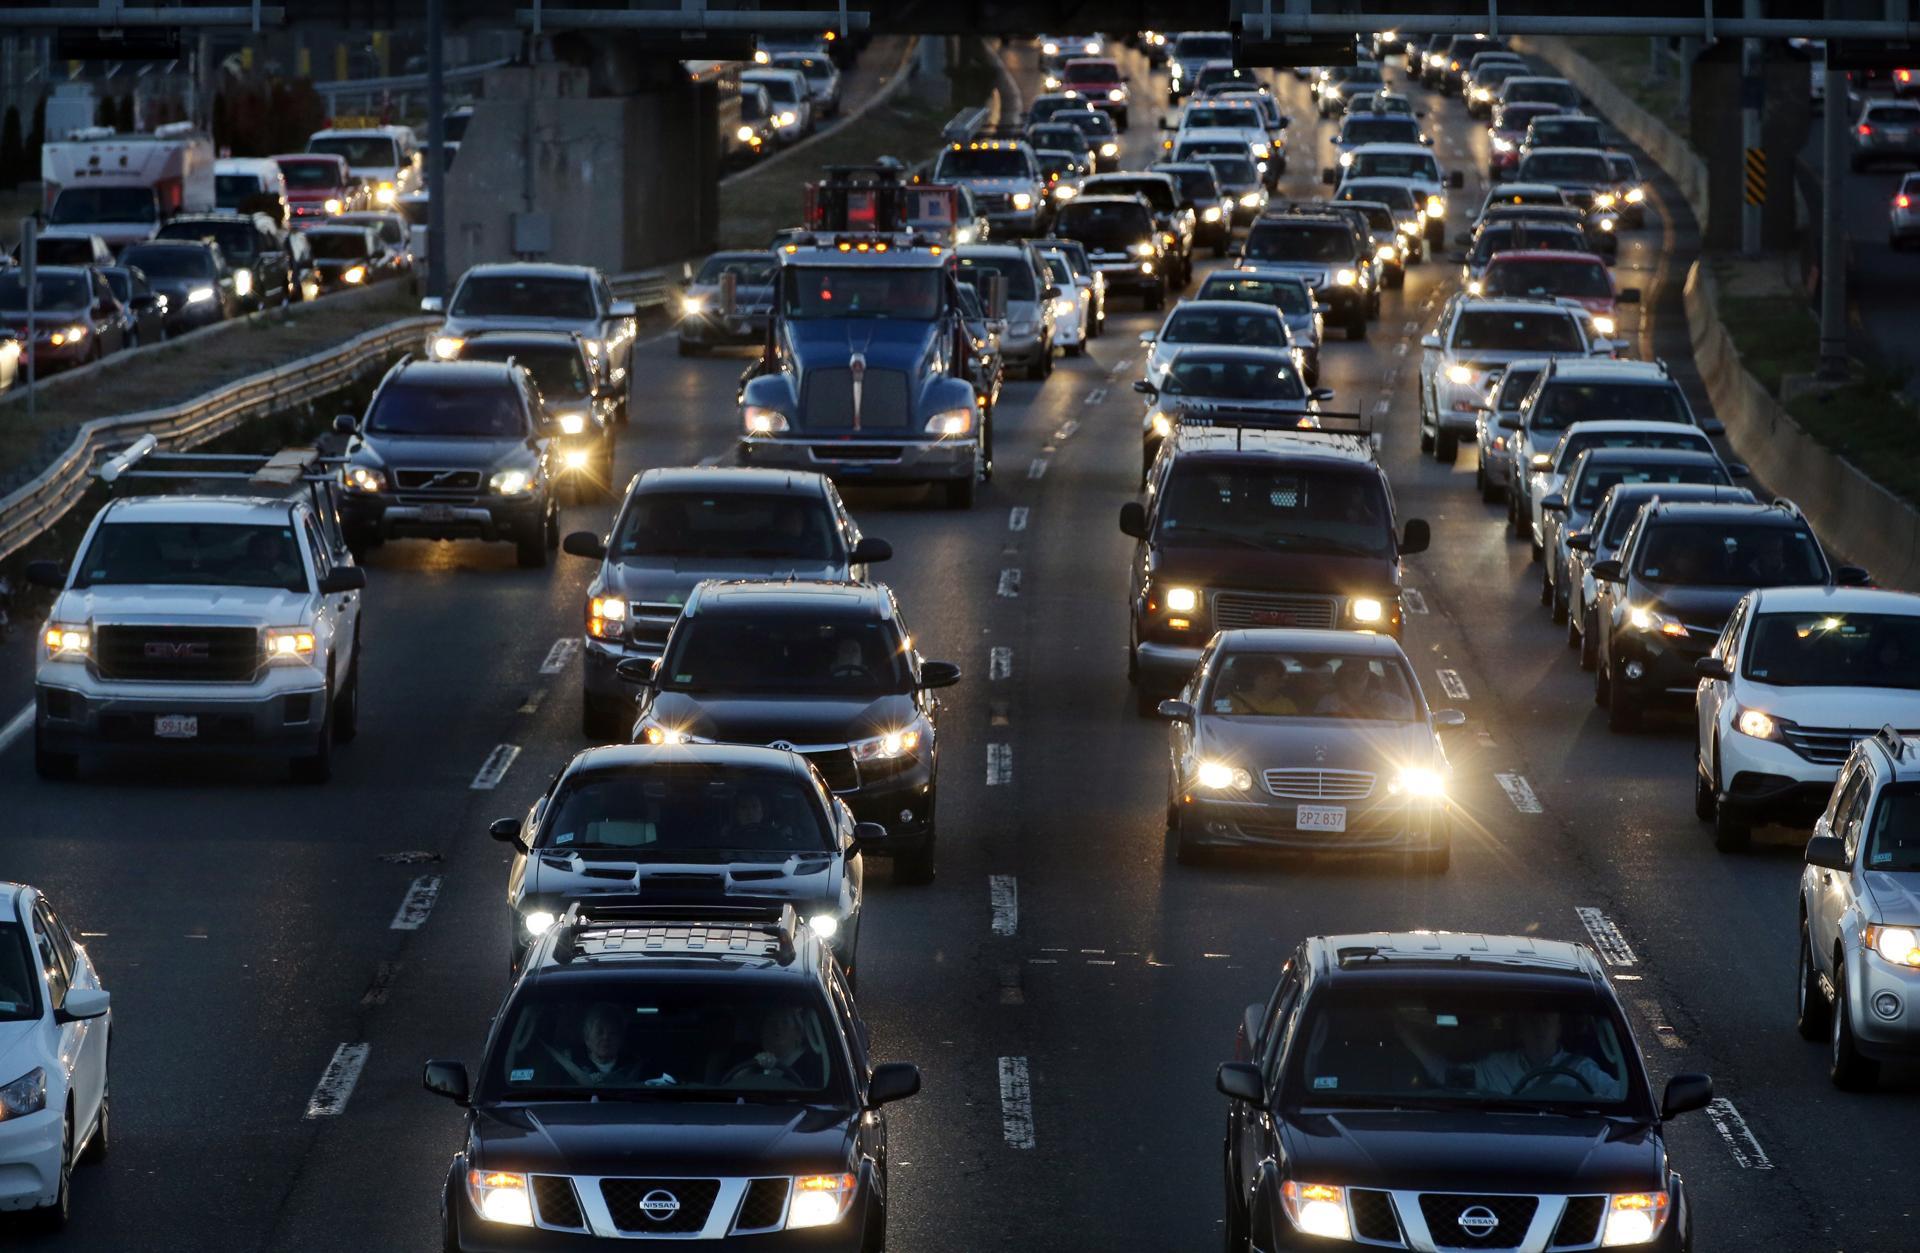 Boston Traffic and Road Conditions | Boston 25 News